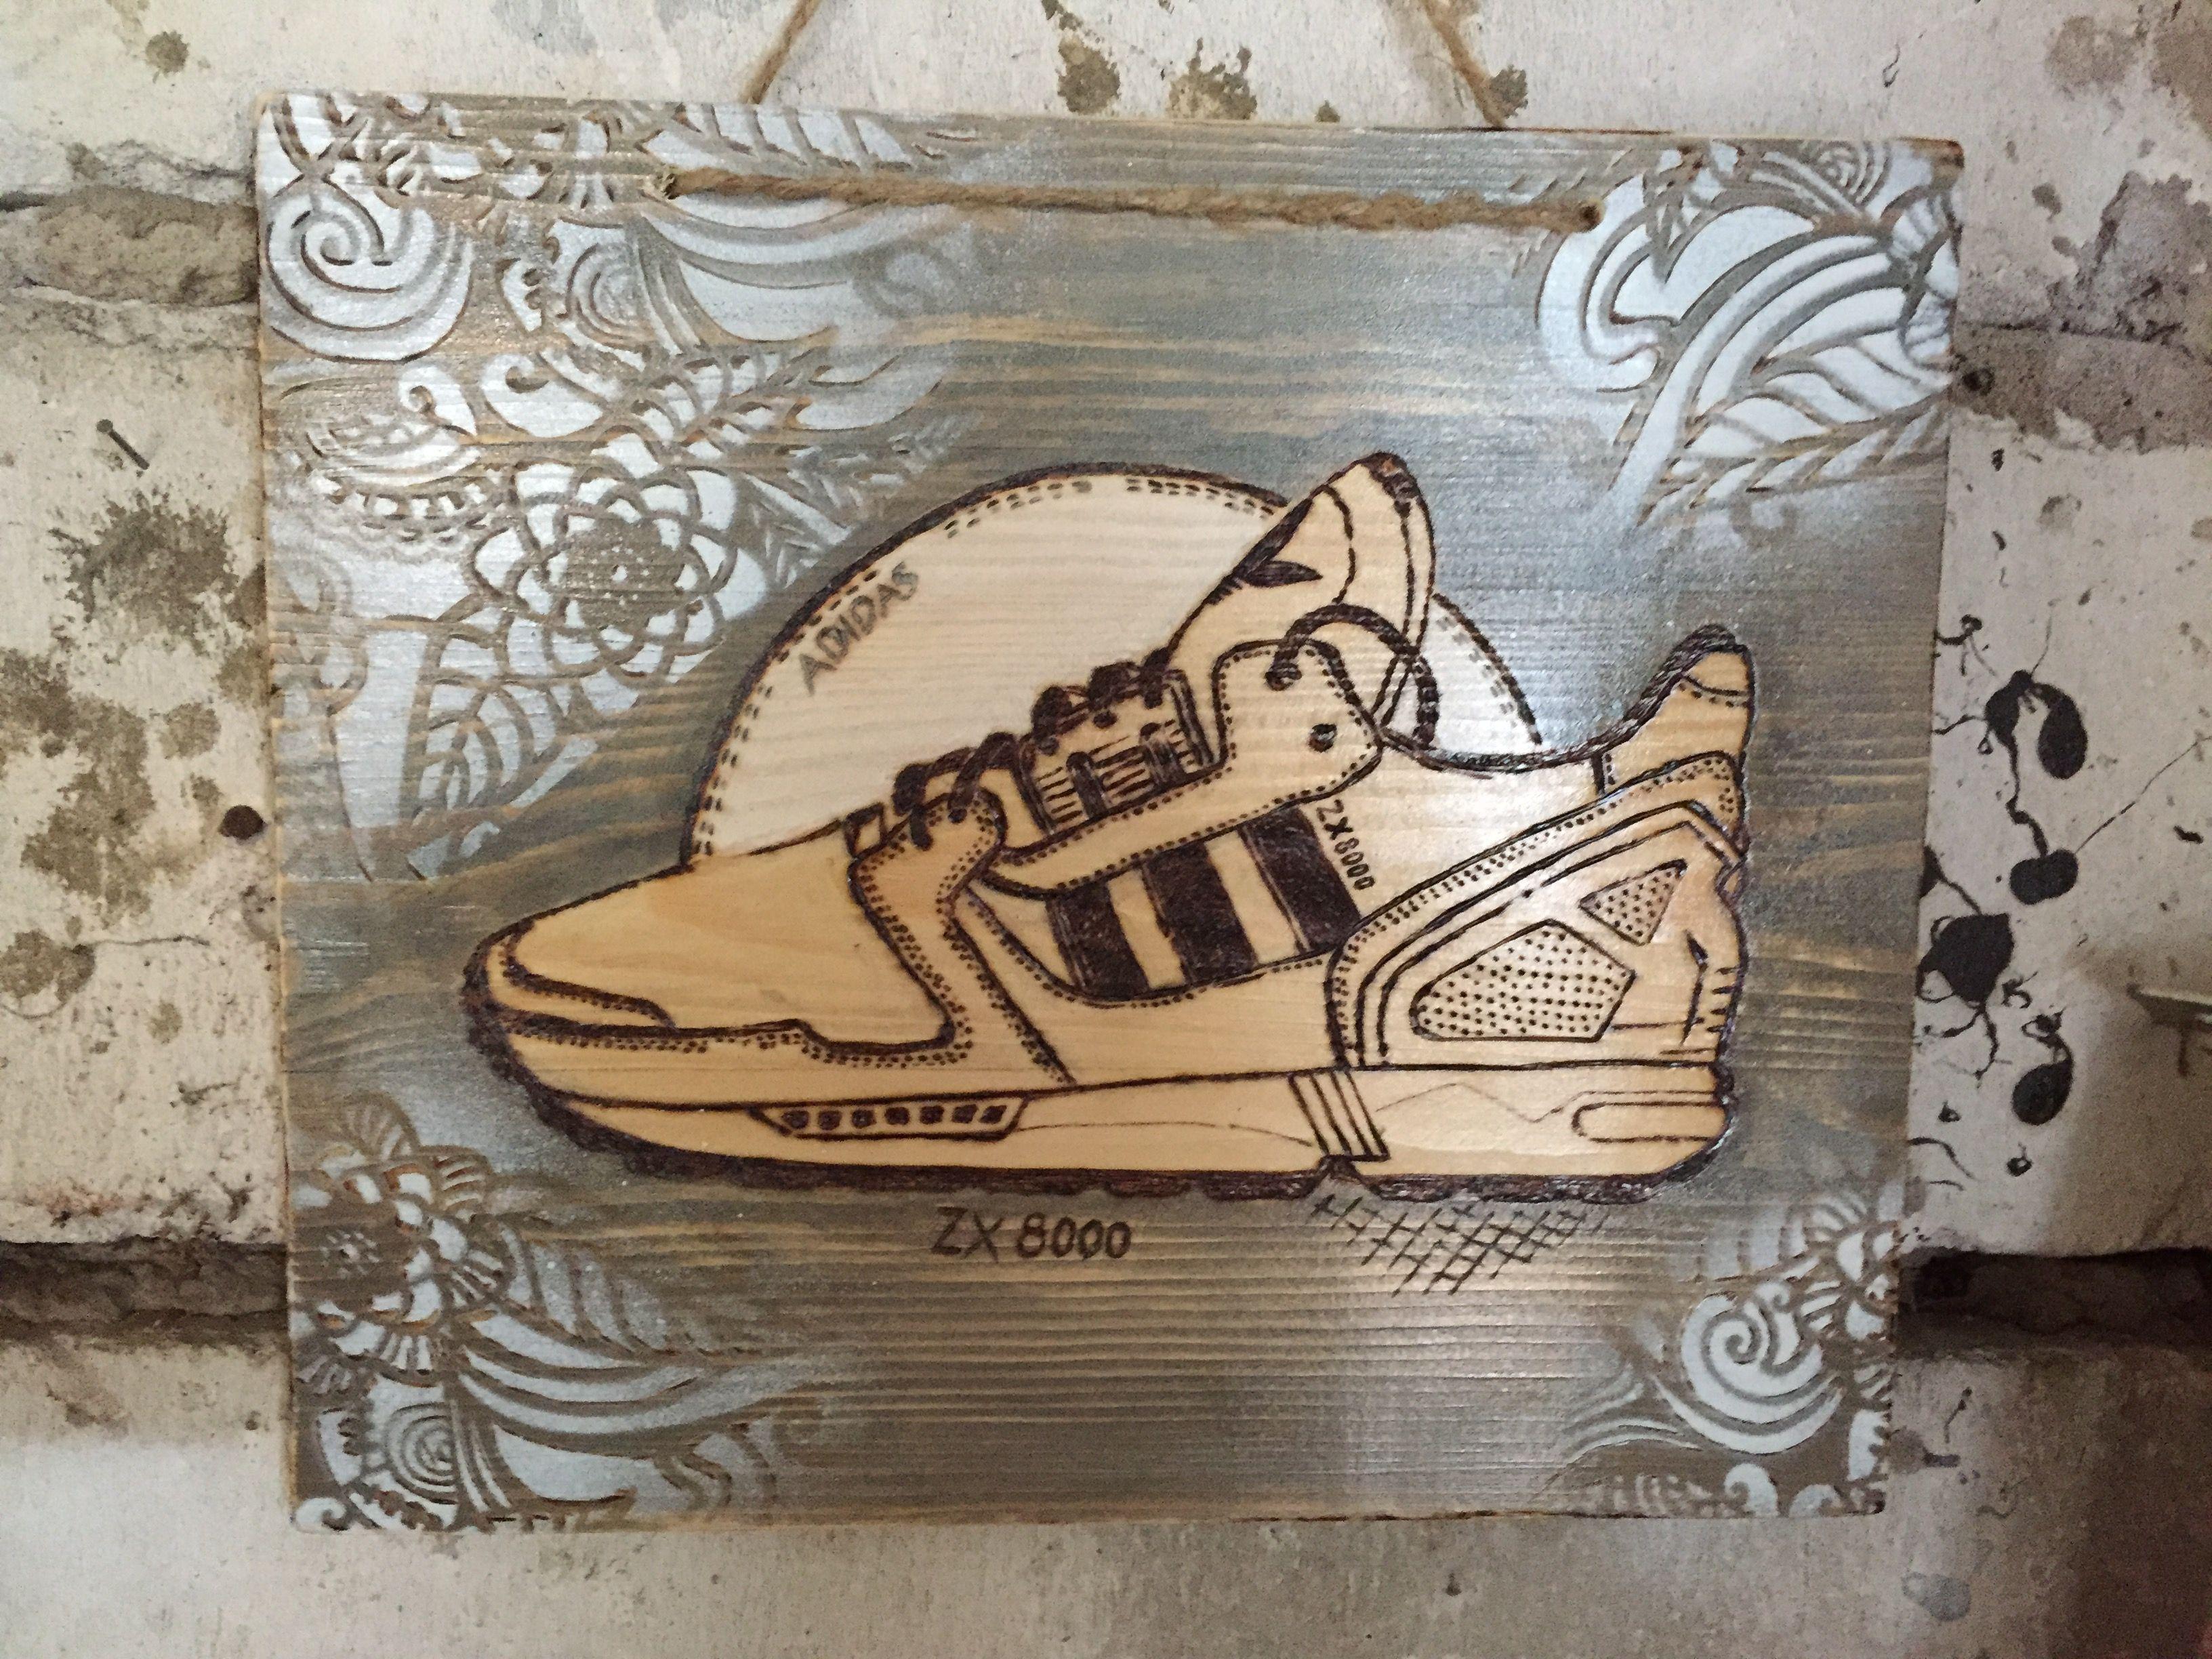 woodcarving #woodbranding #holzbrennen #brennpeter #sneaker #adidas